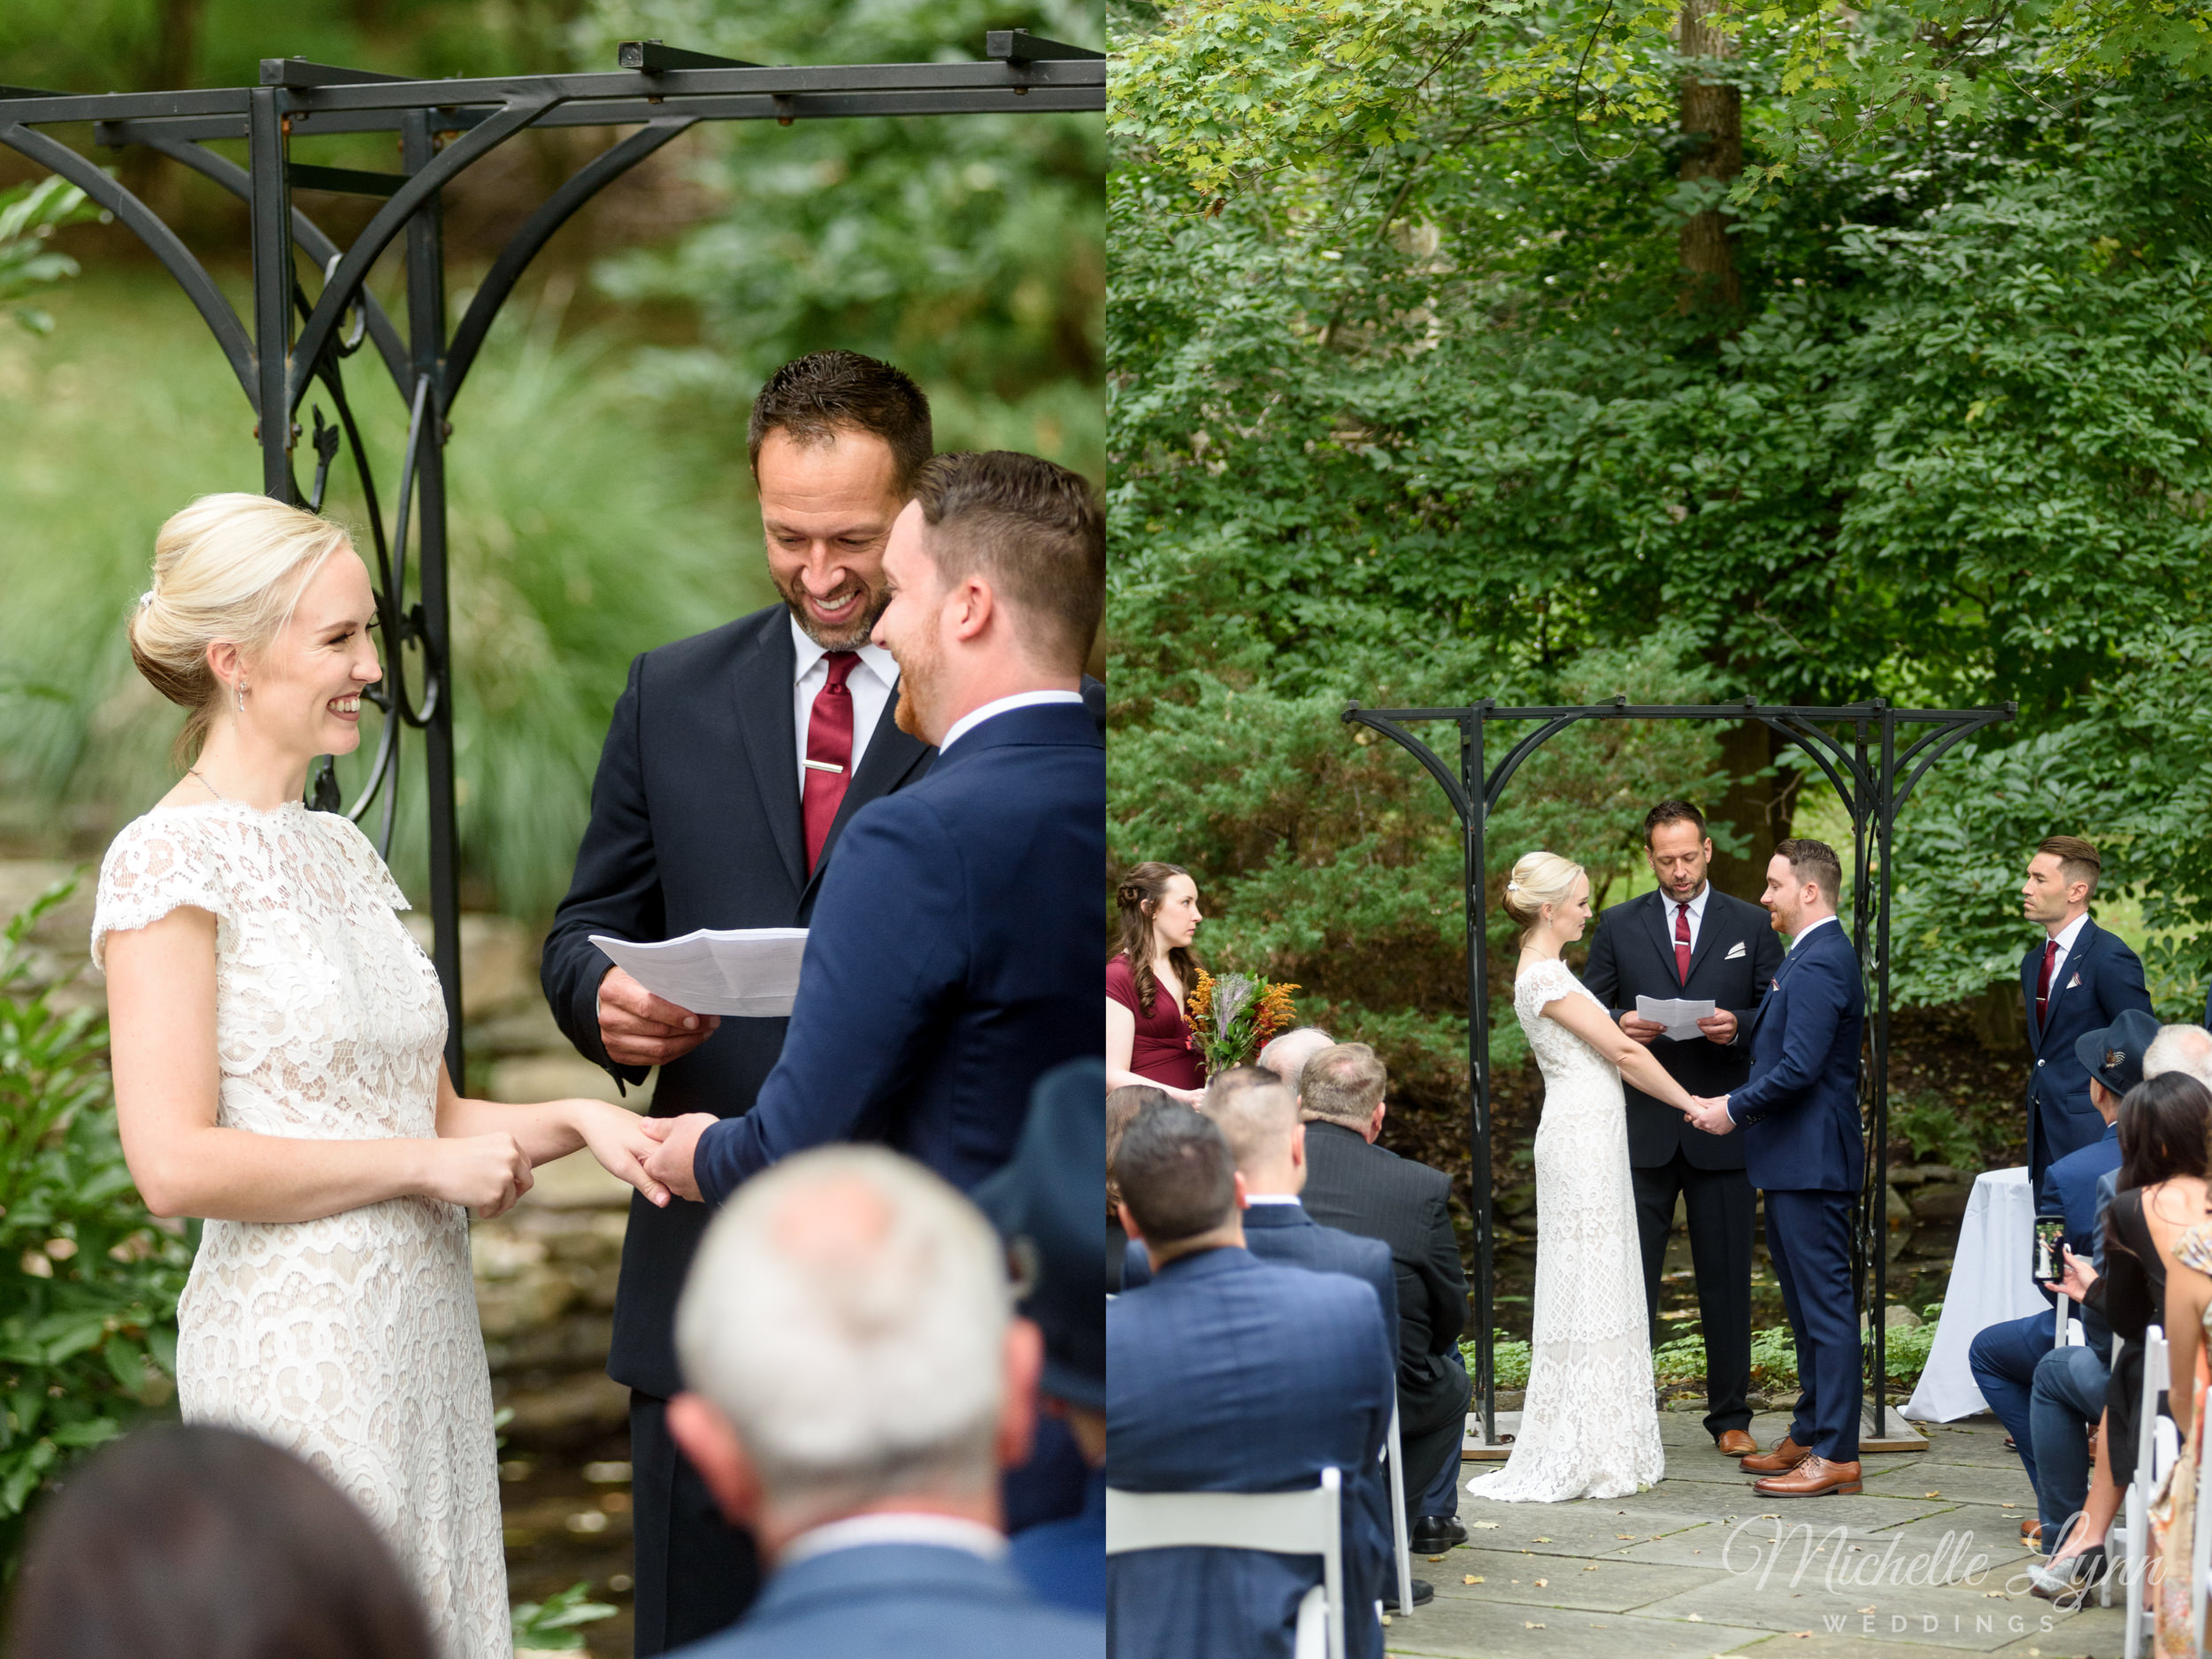 mlw-lumberville-general-store-new-hope-wedding-photographer-43.jpg